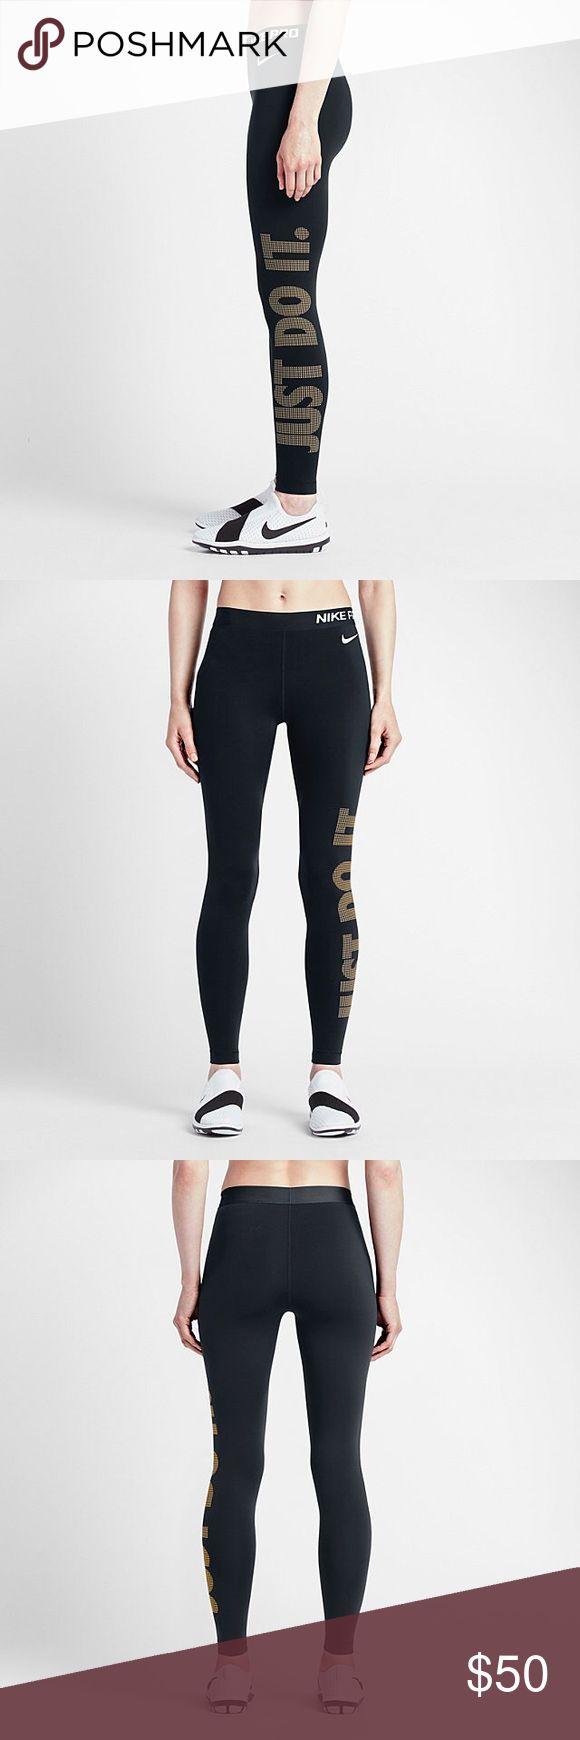 Nike Dri-Fit Black and Gold Leggings Nike black and gold dri-fit leggings size xs! 🚫NO TRADES🚫 Nike Pants